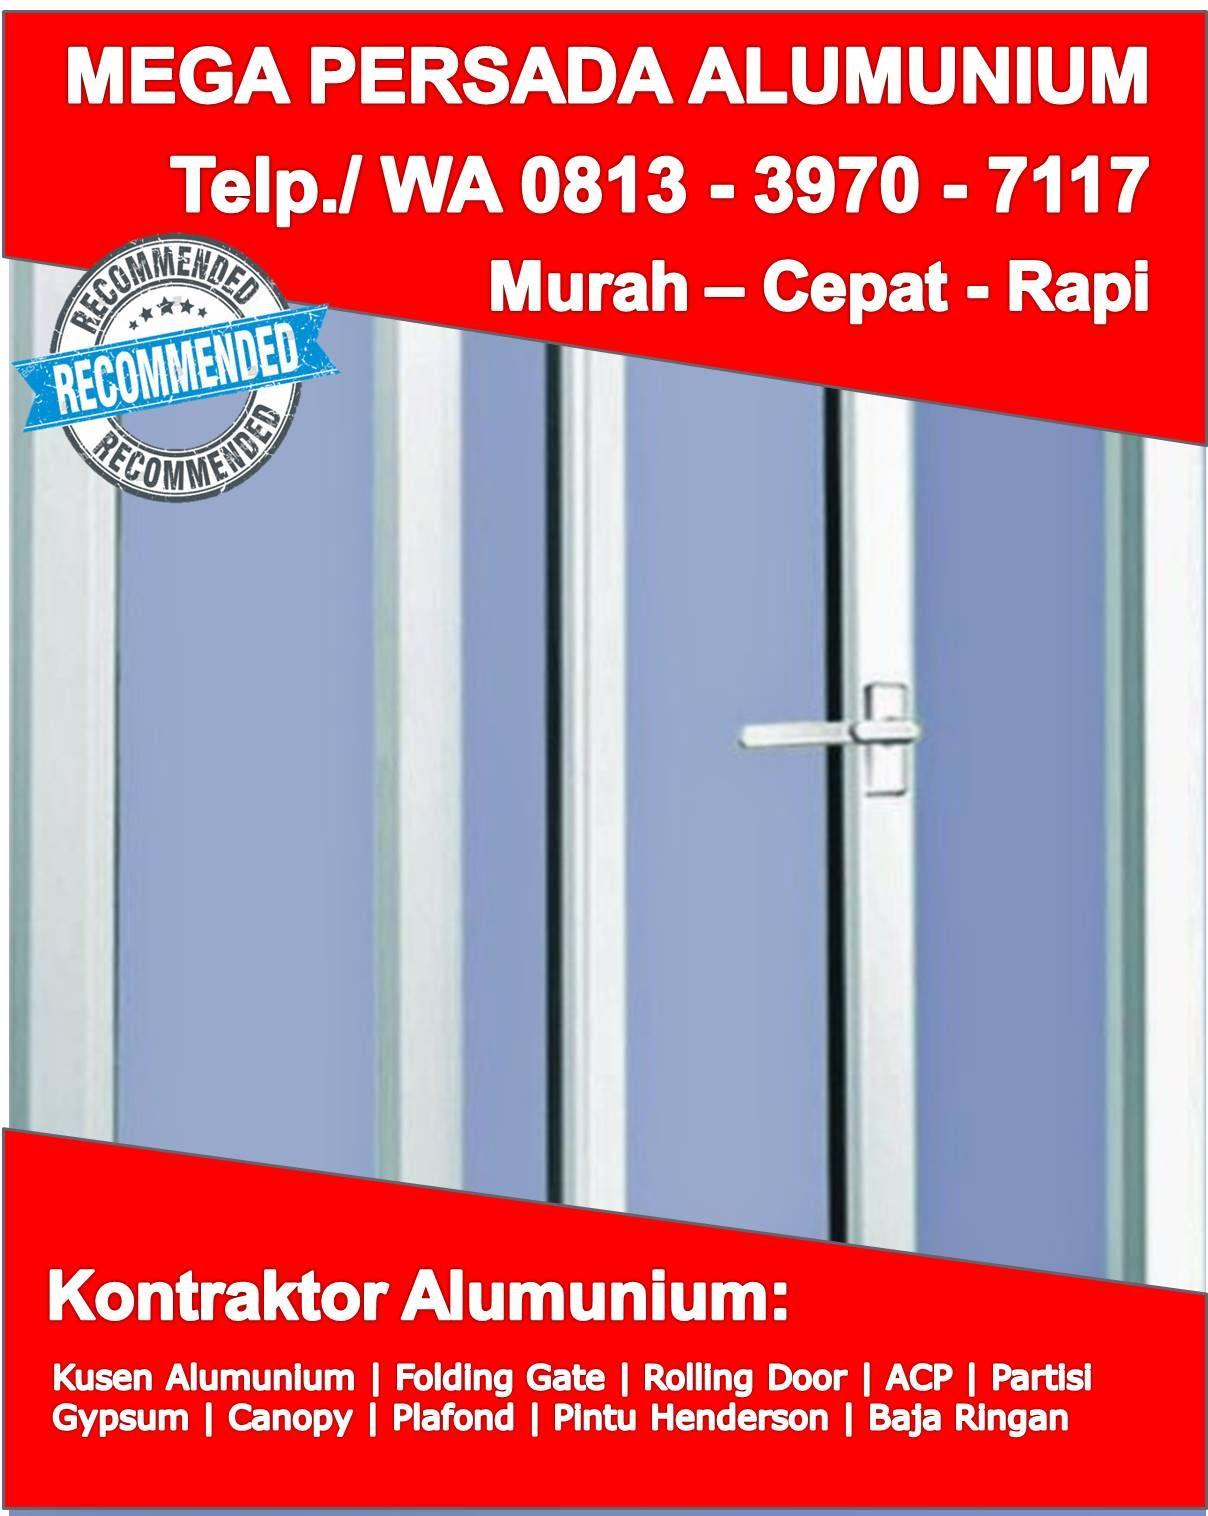 Kusen Aluminium Curtain Wall Sukoharjo Jual Kusen Aluminium Ykk